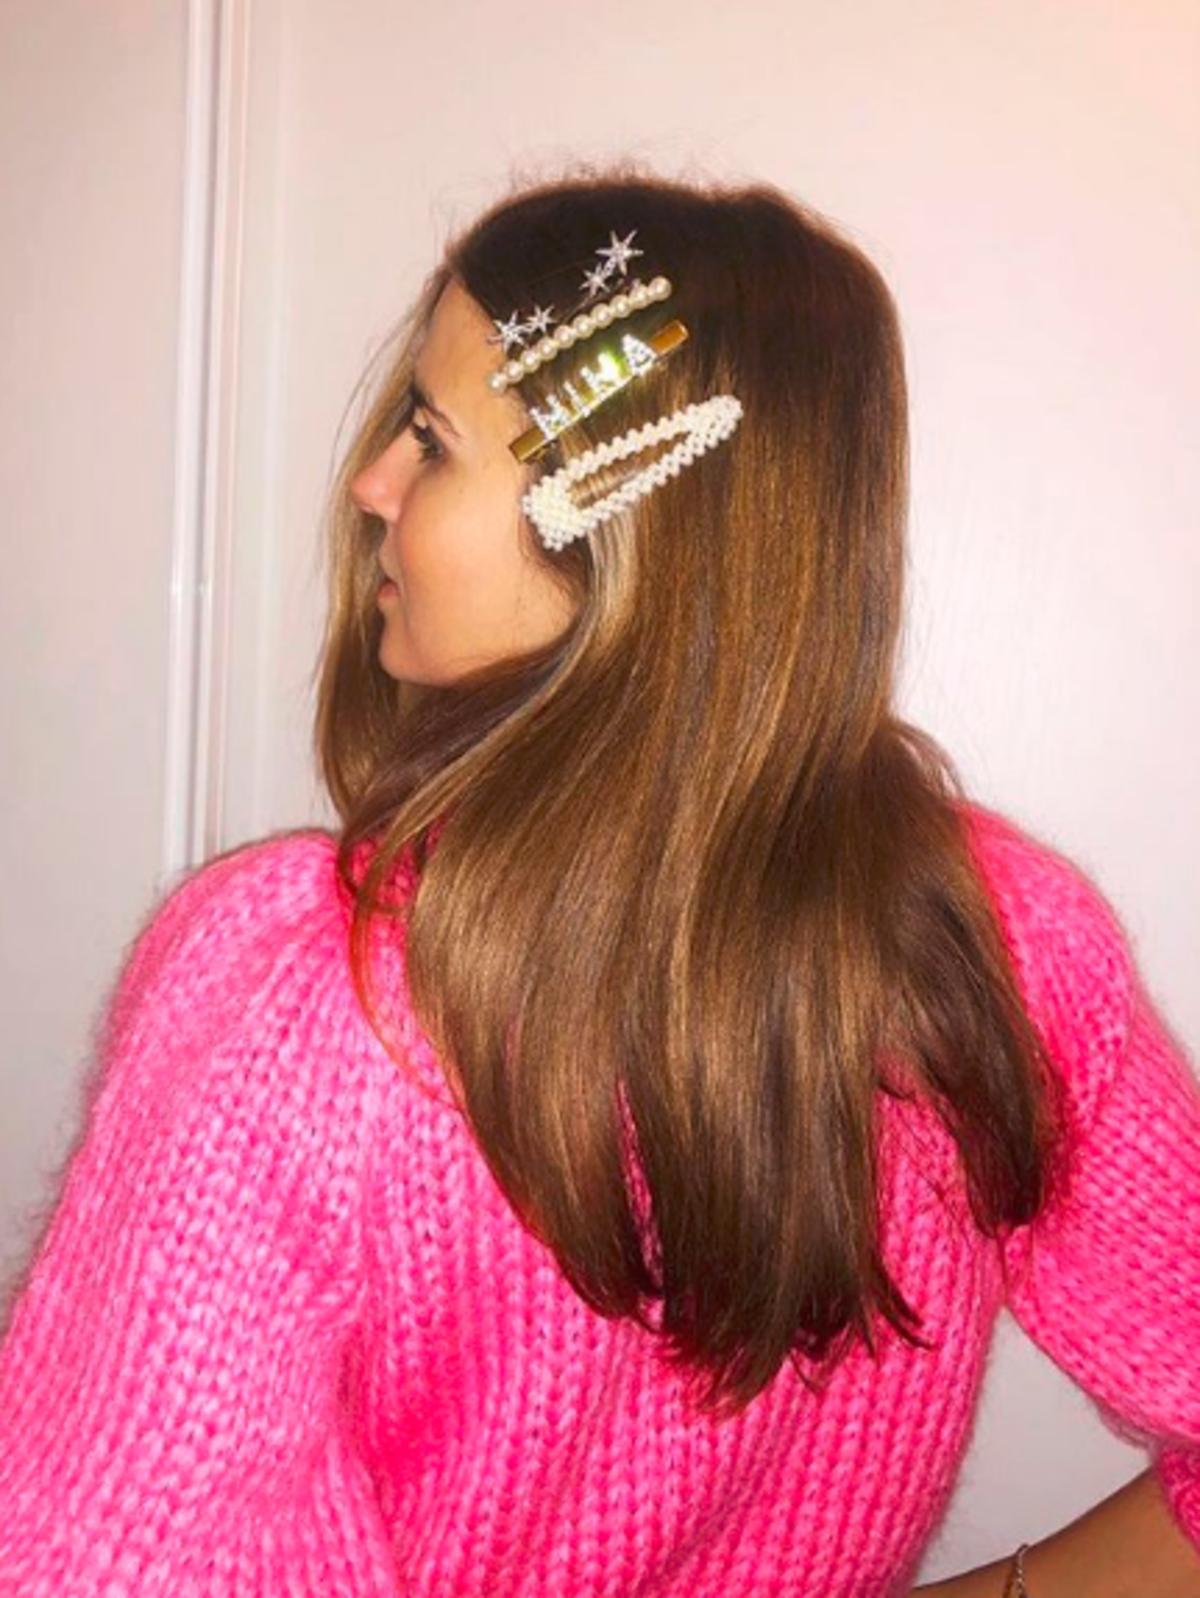 Barette Stacking - noszenie spinek we włosach